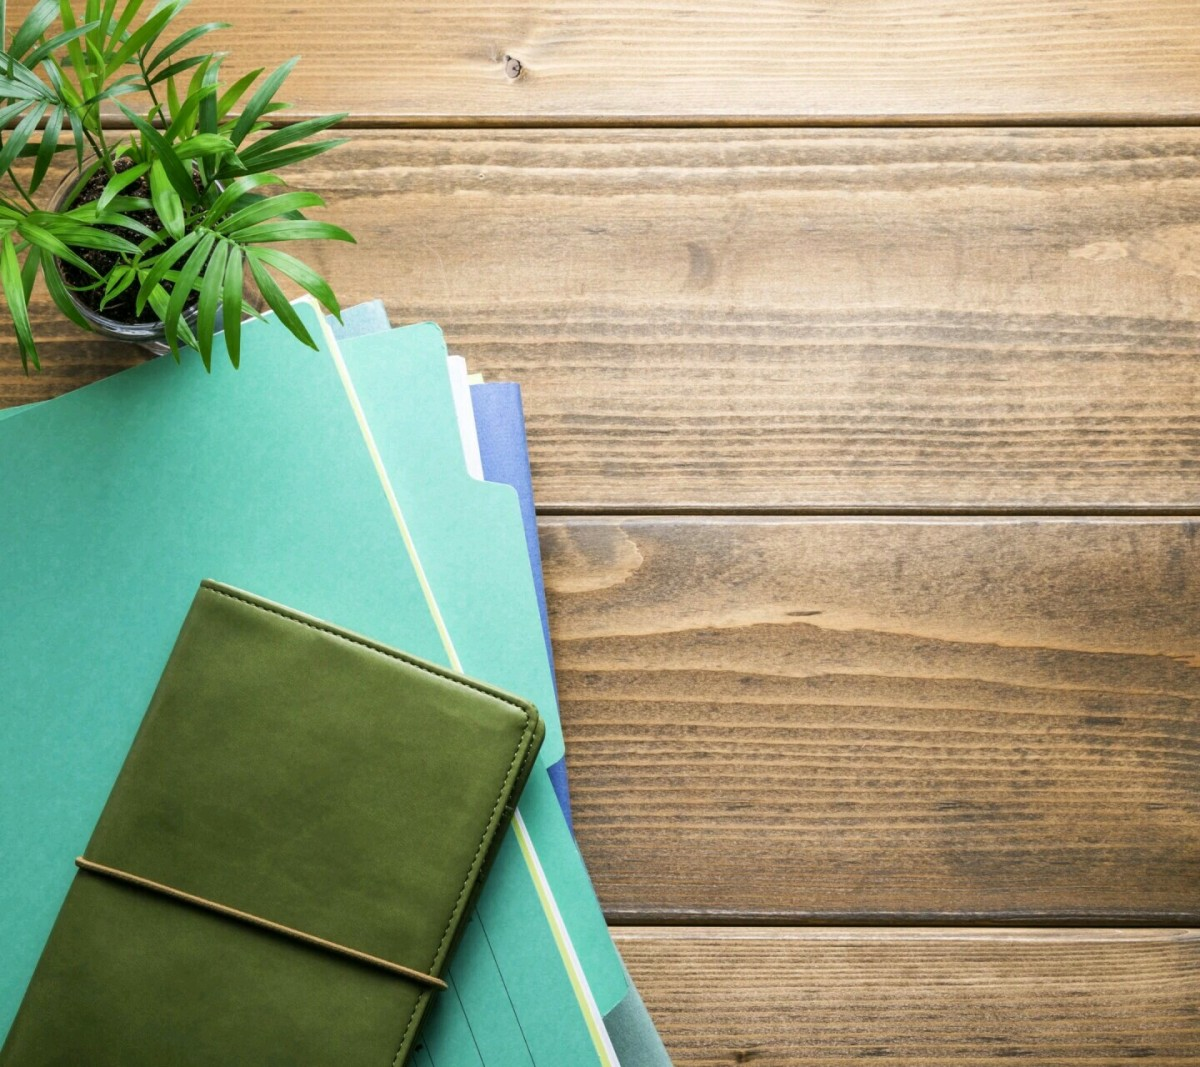 bullet-journaling-a-step-towards-a-productive-life